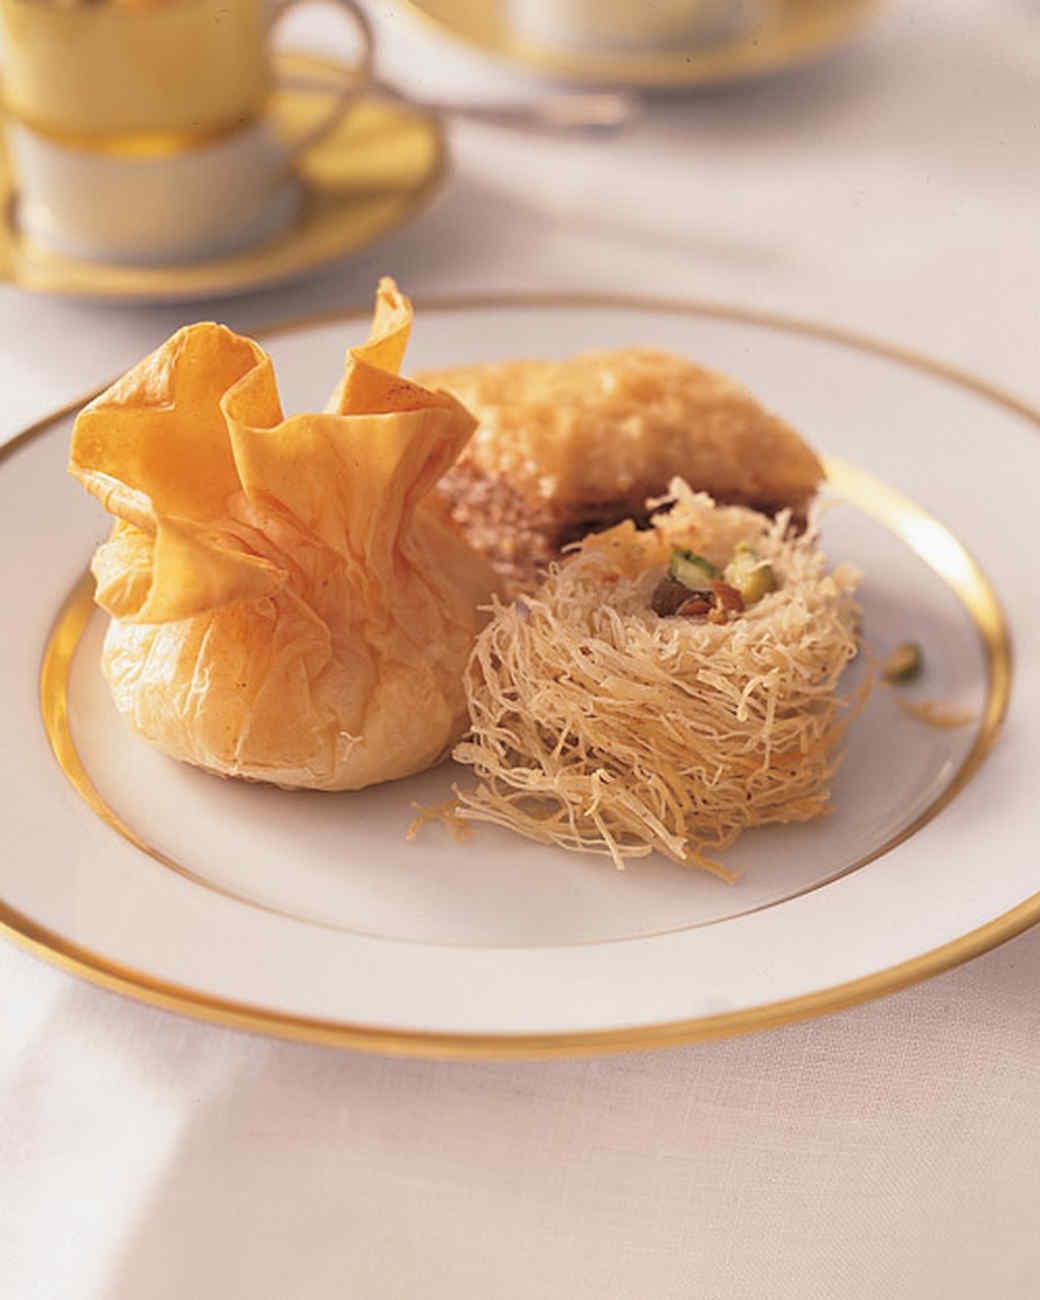 Rolled Baklava with Golden Raisins